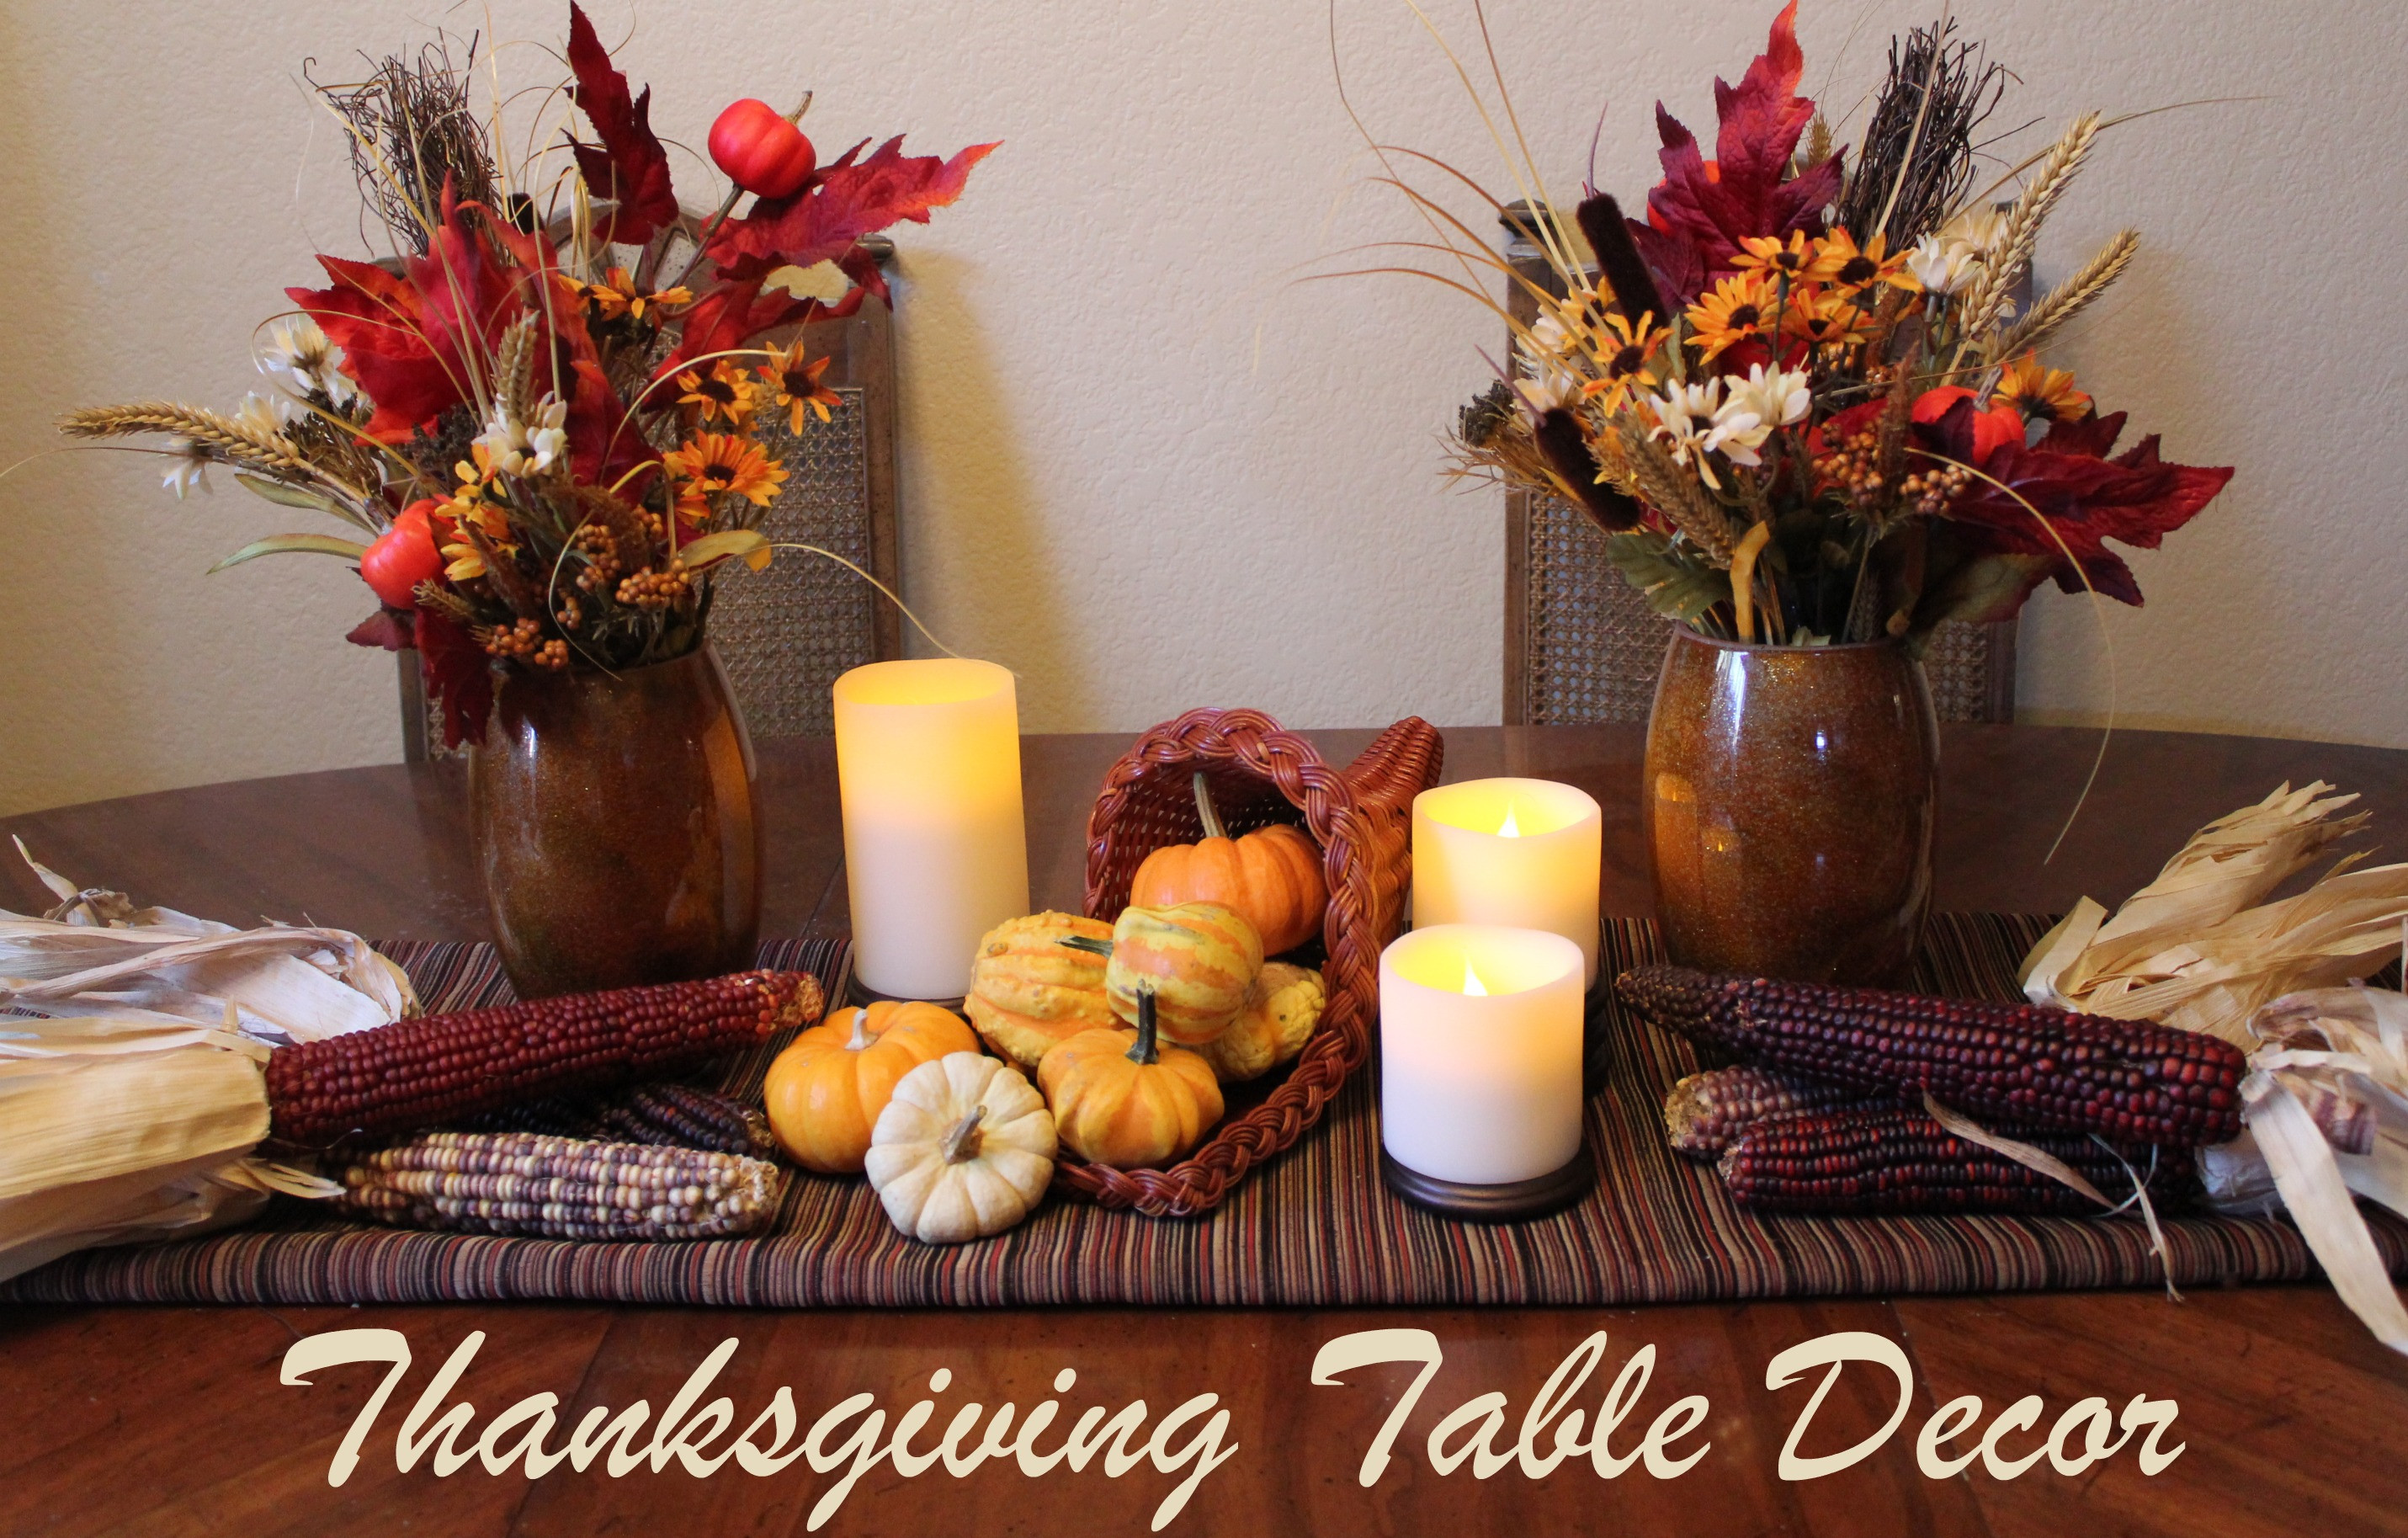 Diy Thanksgiving Table Decorations  Cornucopia of Creativity DIY Thanksgiving Table Decor